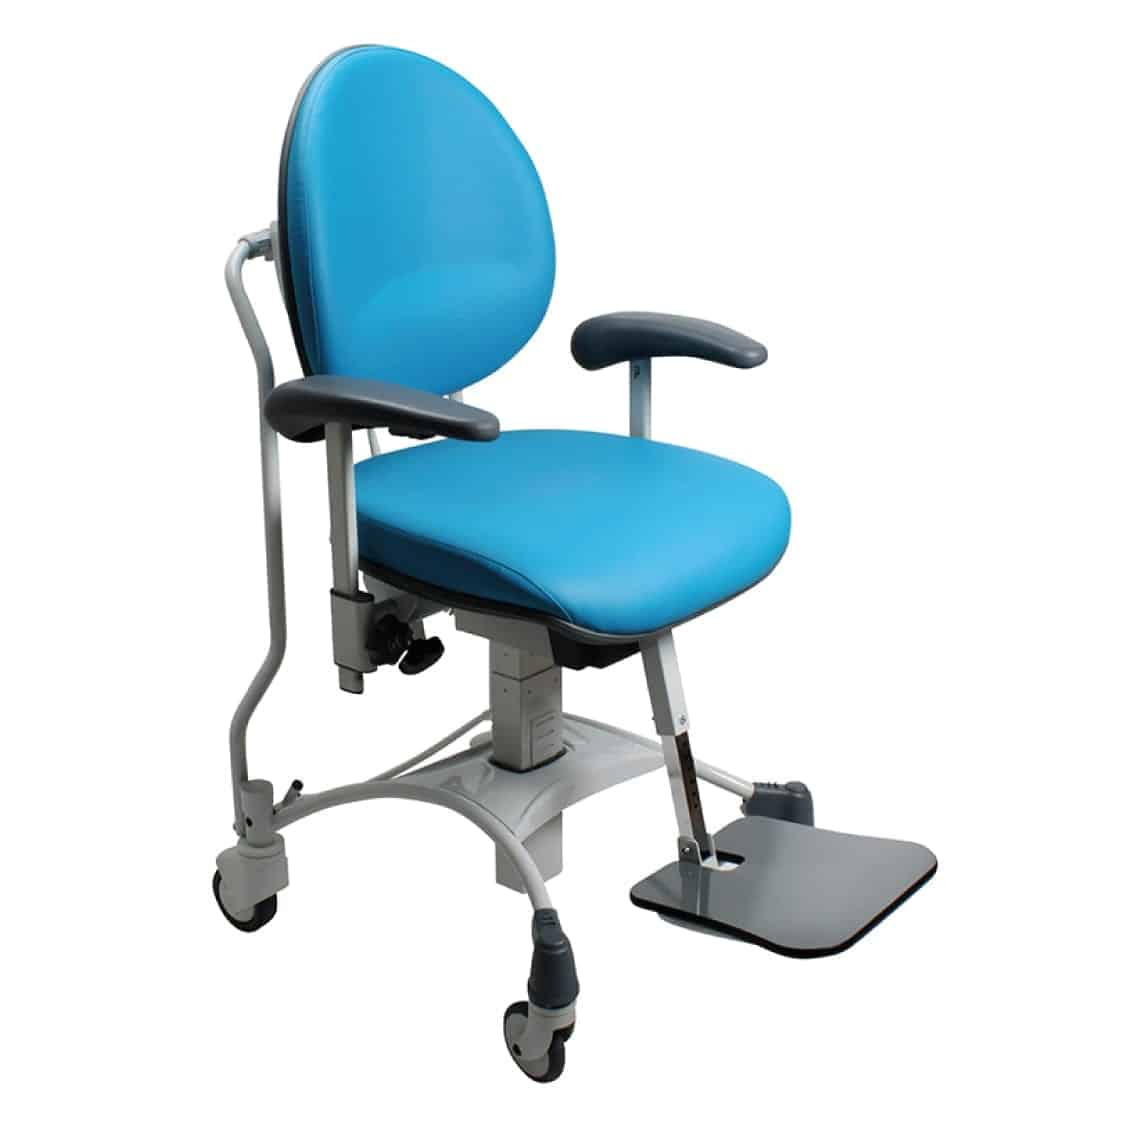 posture promoting chair peg perego prima pappa zero3 high reviews ergonomic seating agile medical